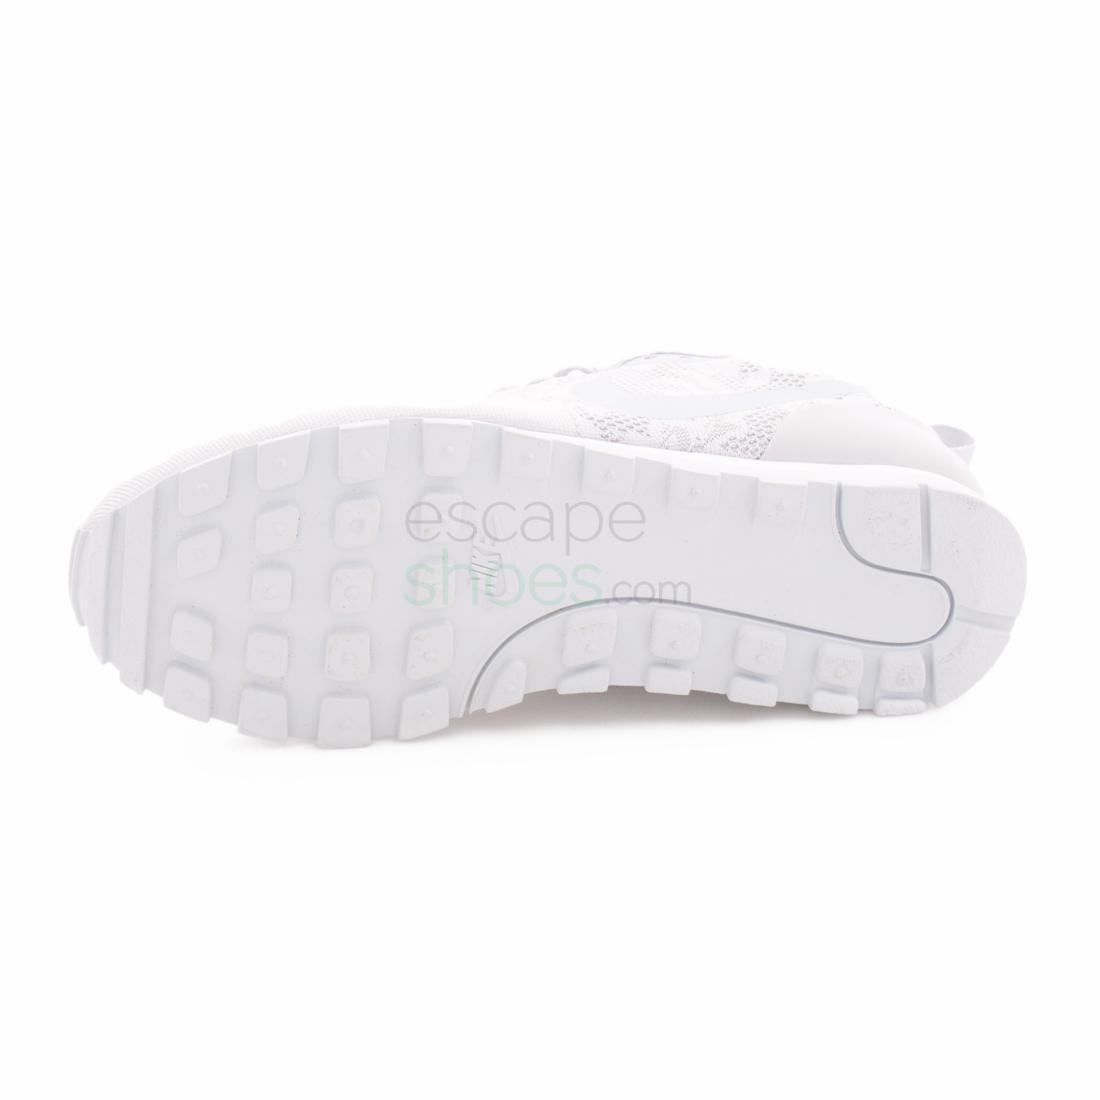 Sneakers NIKE MD Runner 2 Br Wolf Grey 902858 002